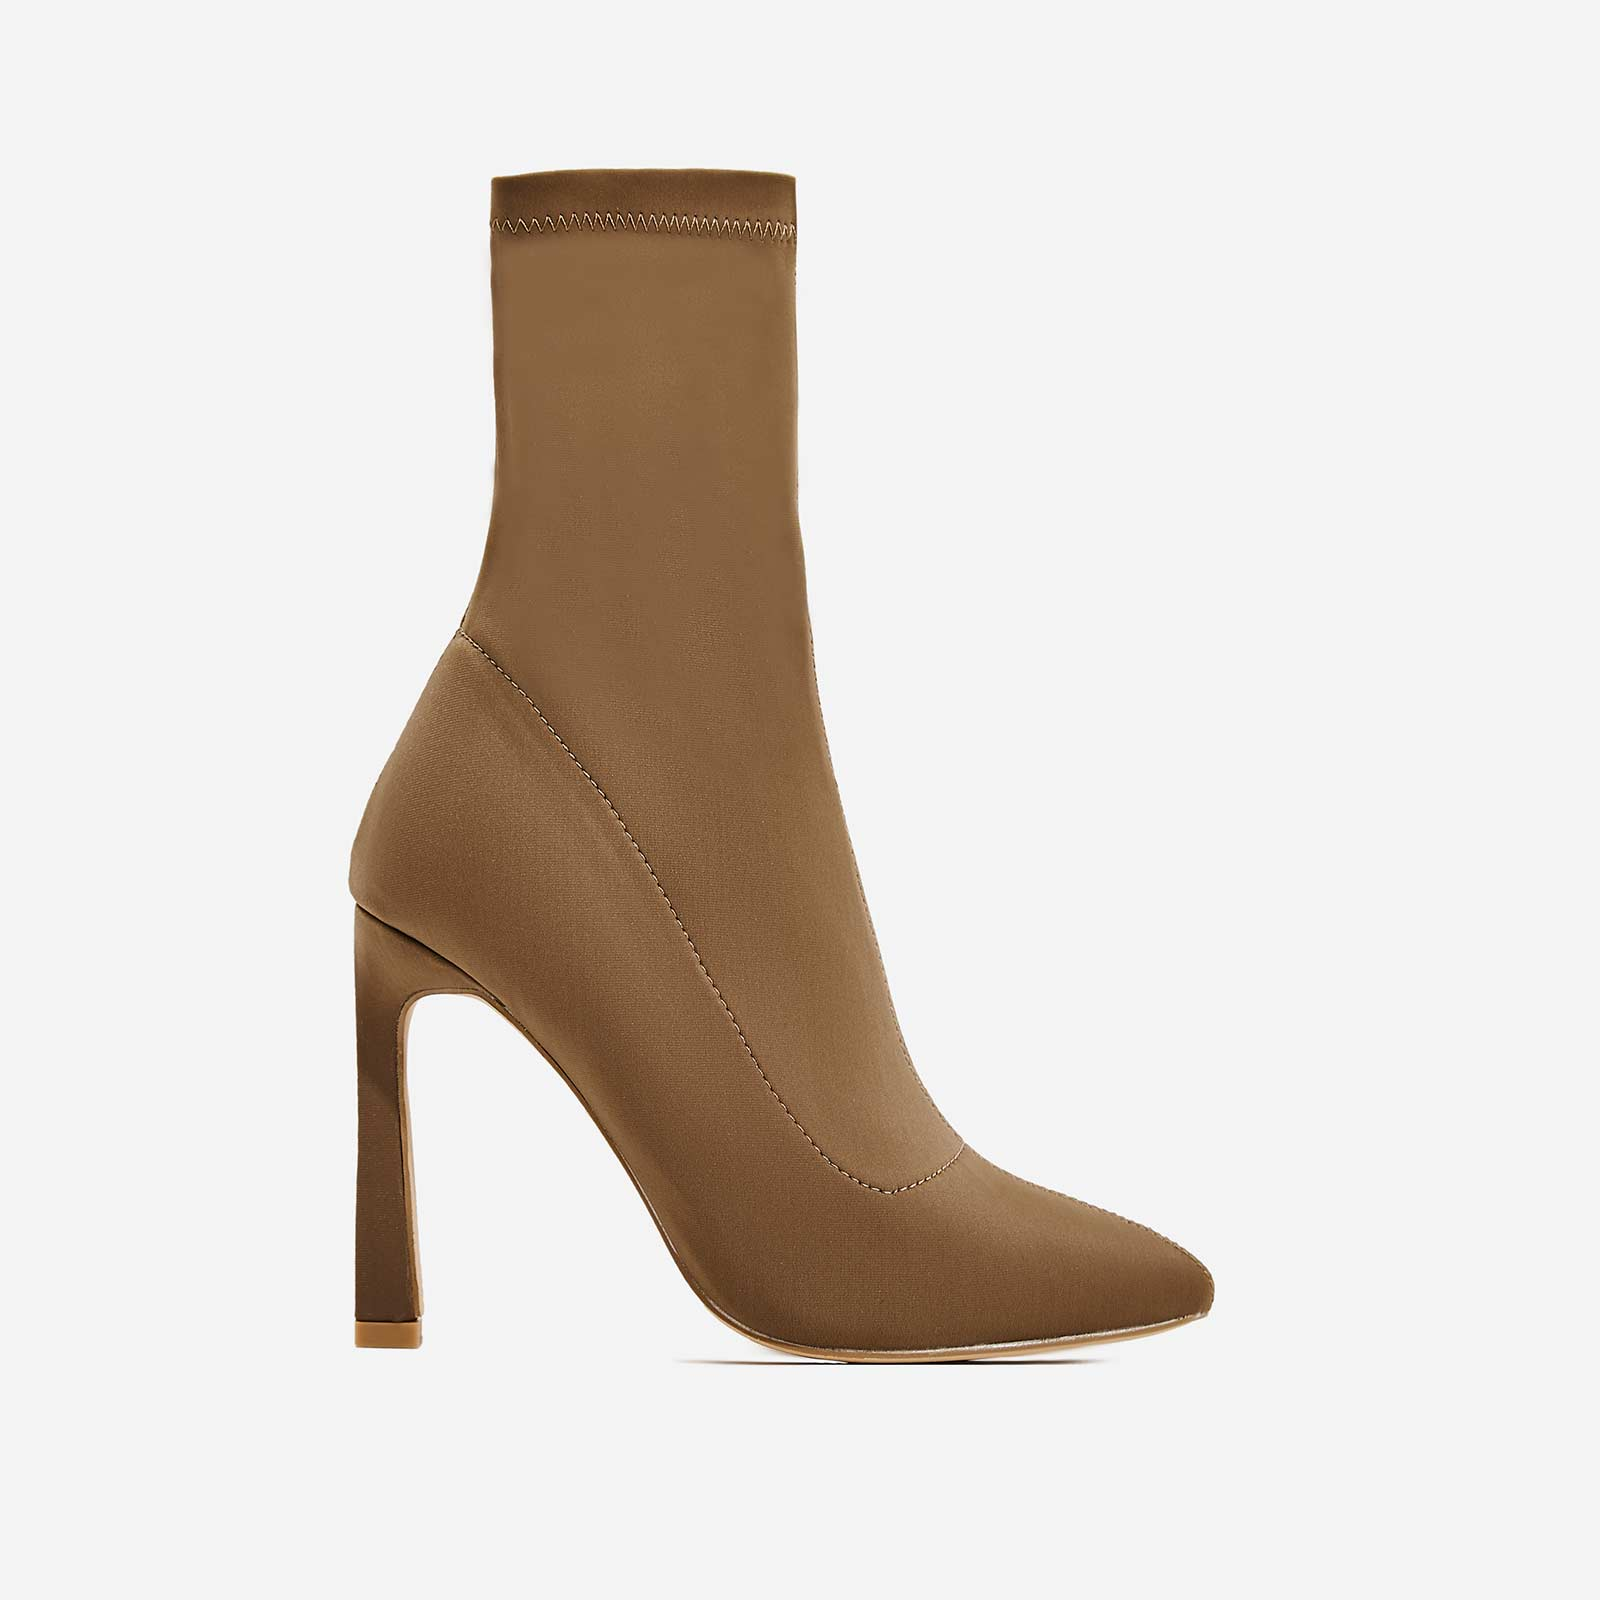 Mackenzie Flared Stiletto Heel Ankle Sock Boot In Khaki Lycra